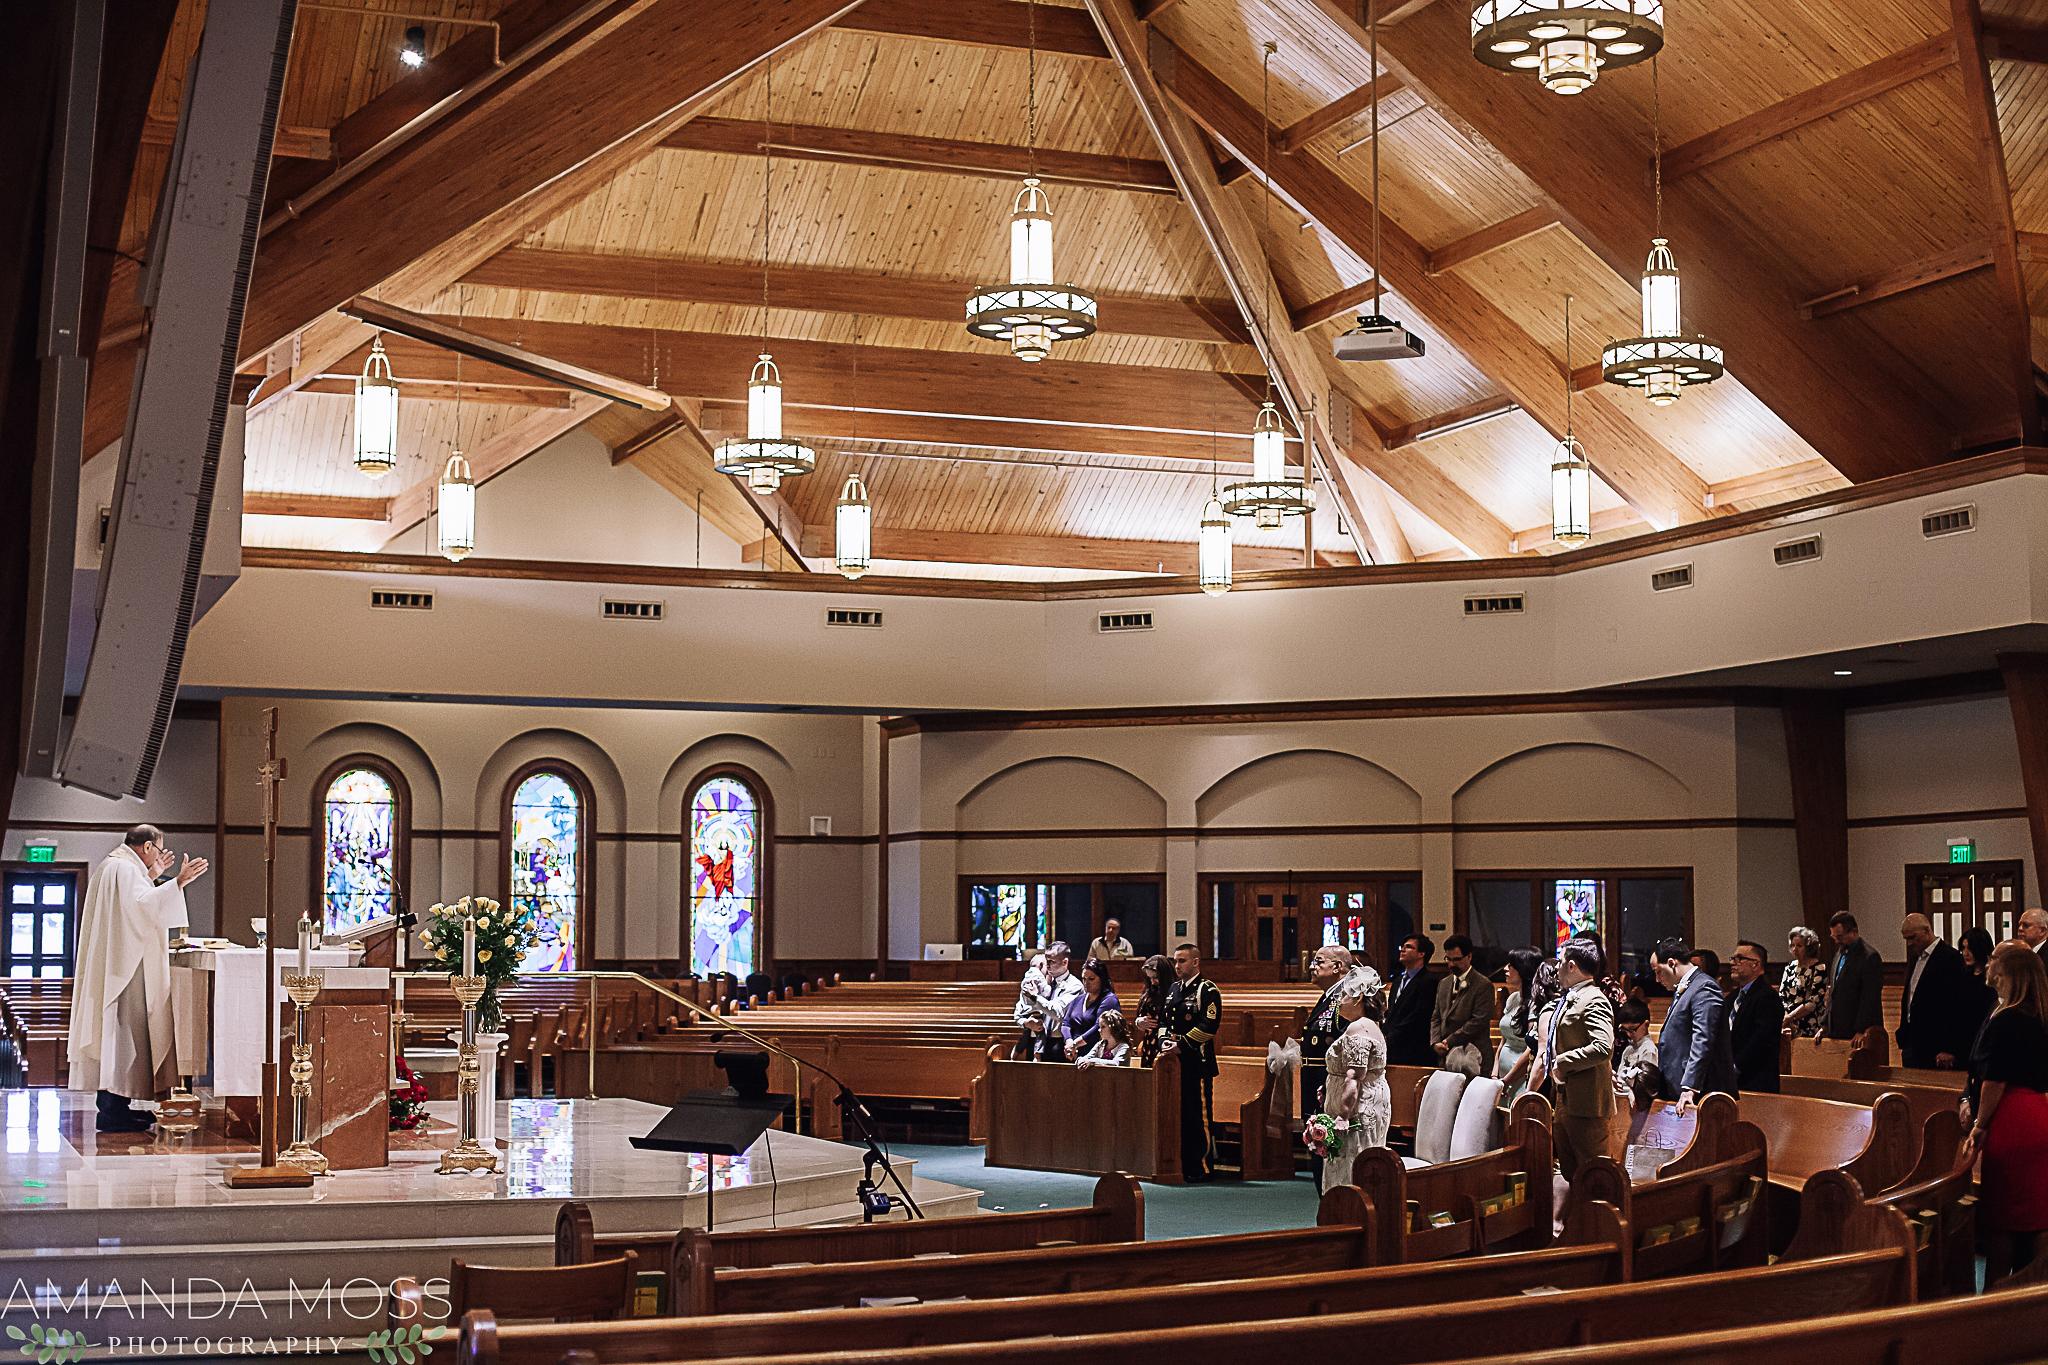 charlotte north carolina fort mill south carolina wedding photographer catholic intimate